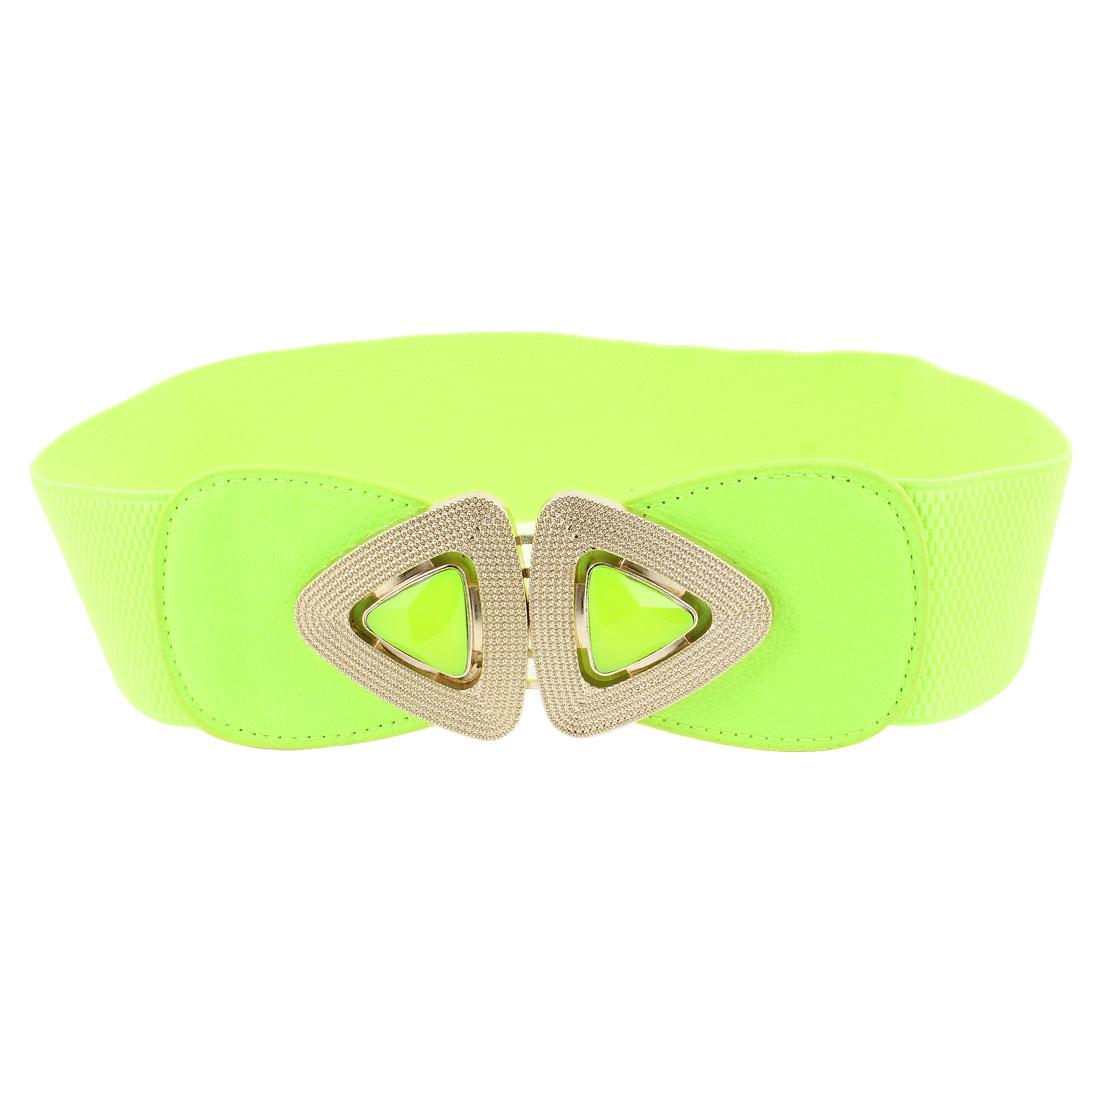 Metal Interlocking Buckle 6cm Wide Green Elastic Waist Belt Band Waistband